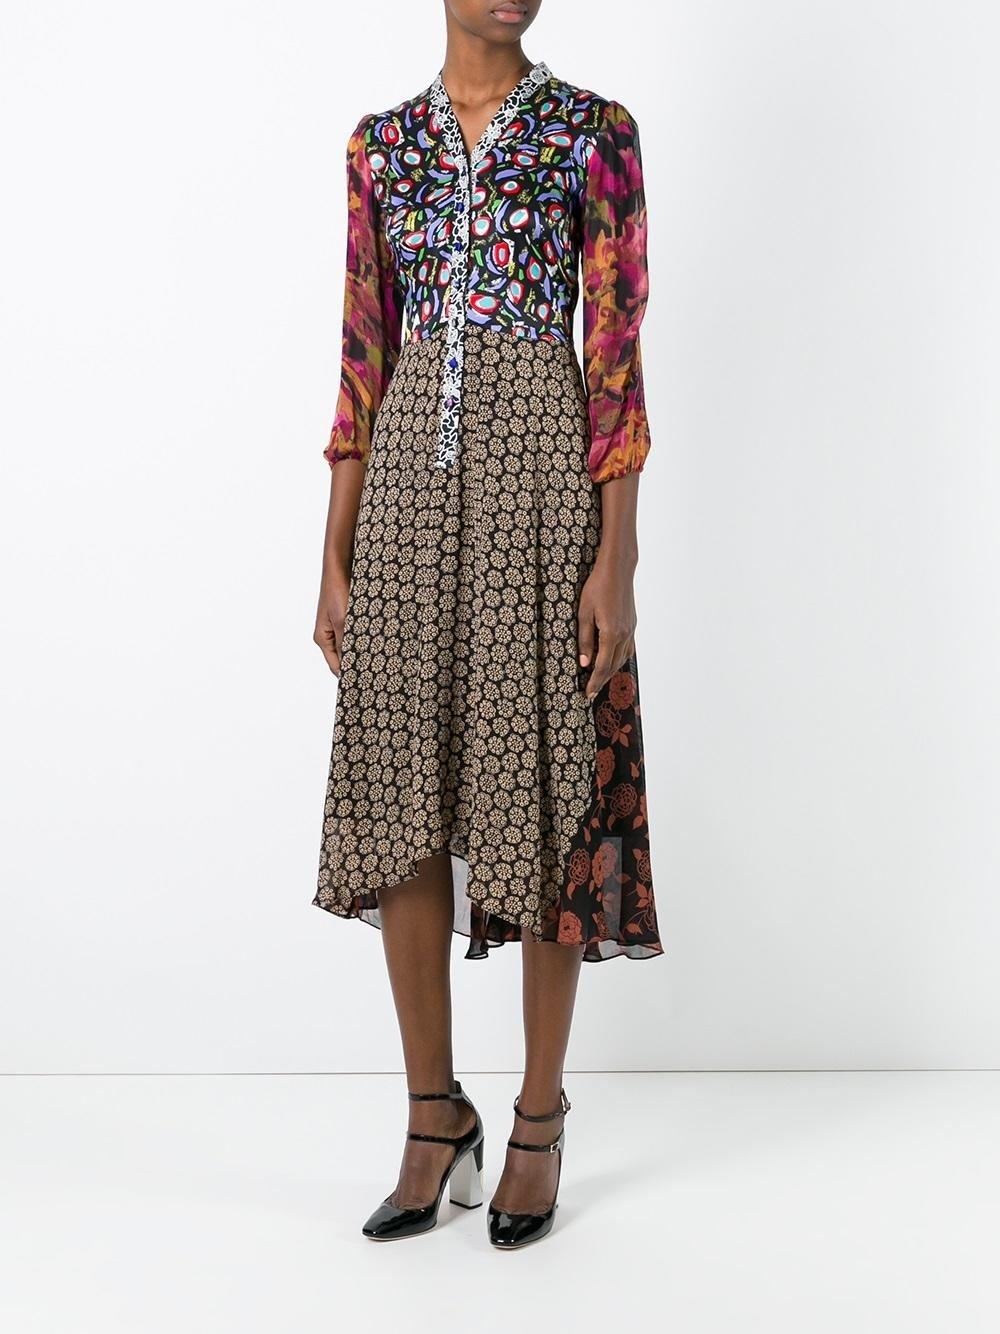 7d17113b541 Модное платье-рубашка 2018 2019 года  фото